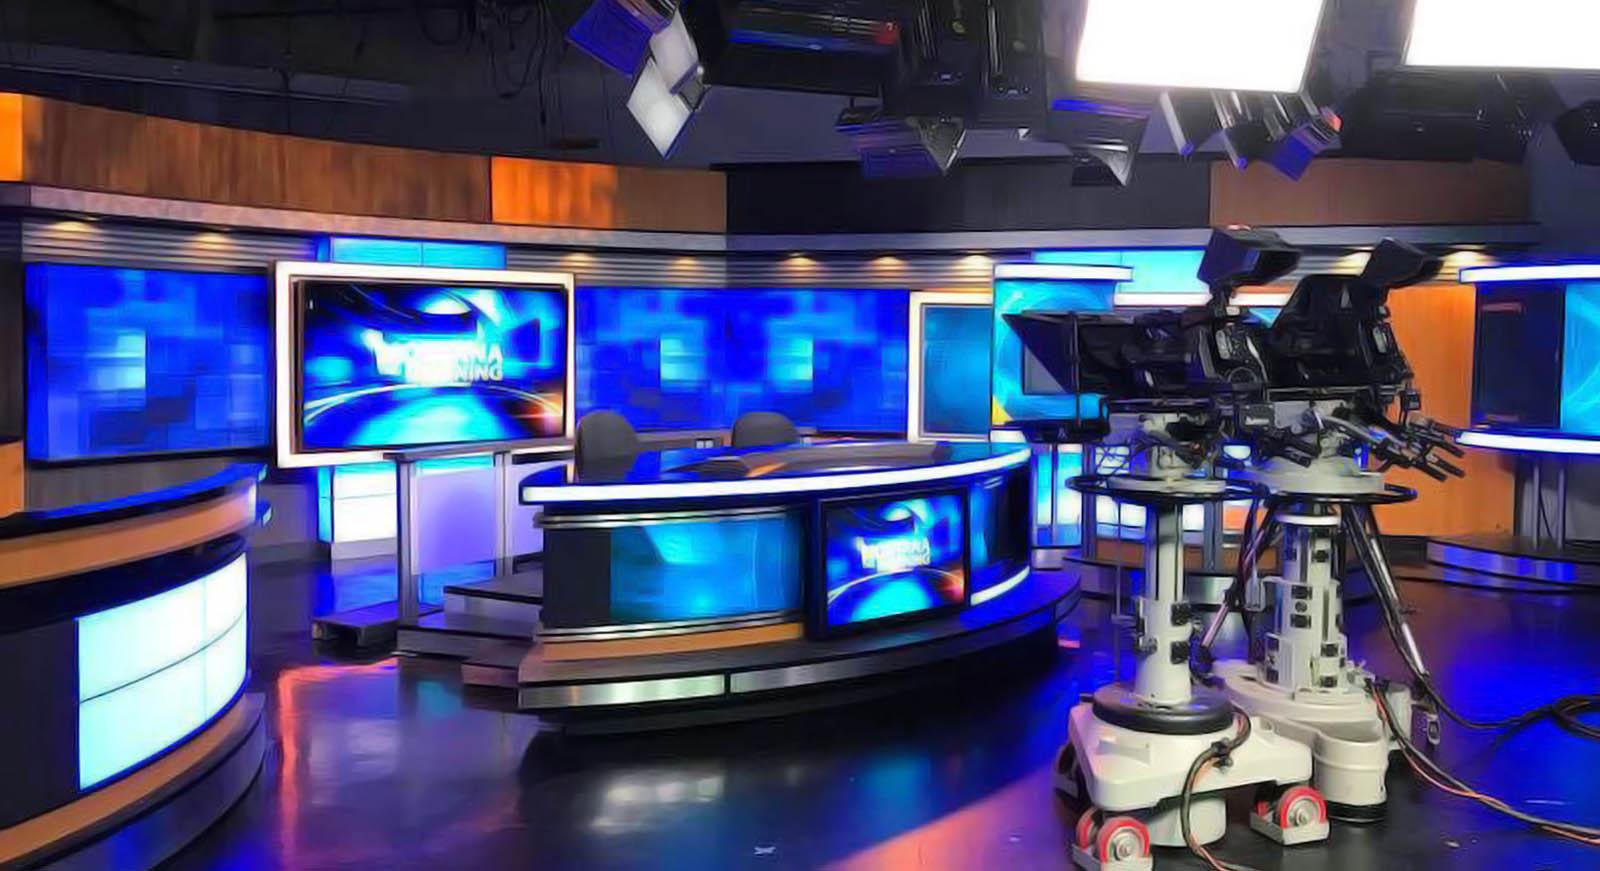 KPAX News Live Coverage Studio